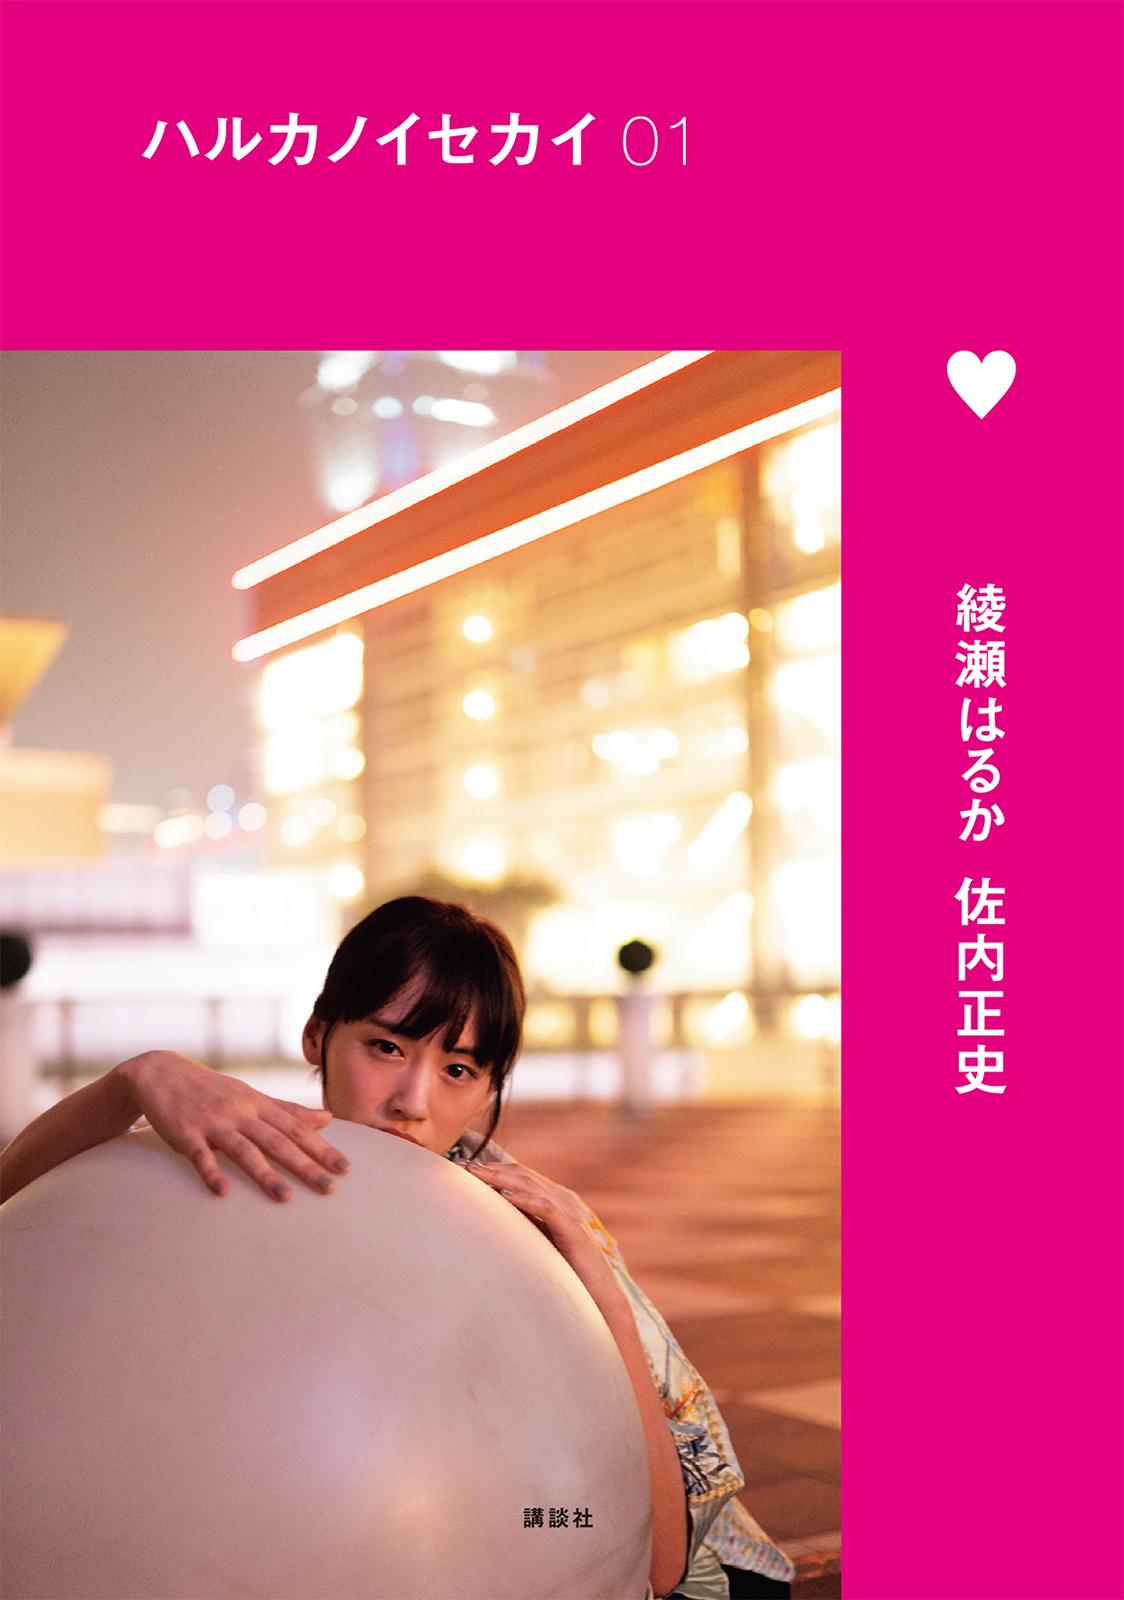 harukanoisekai_cover.jpg